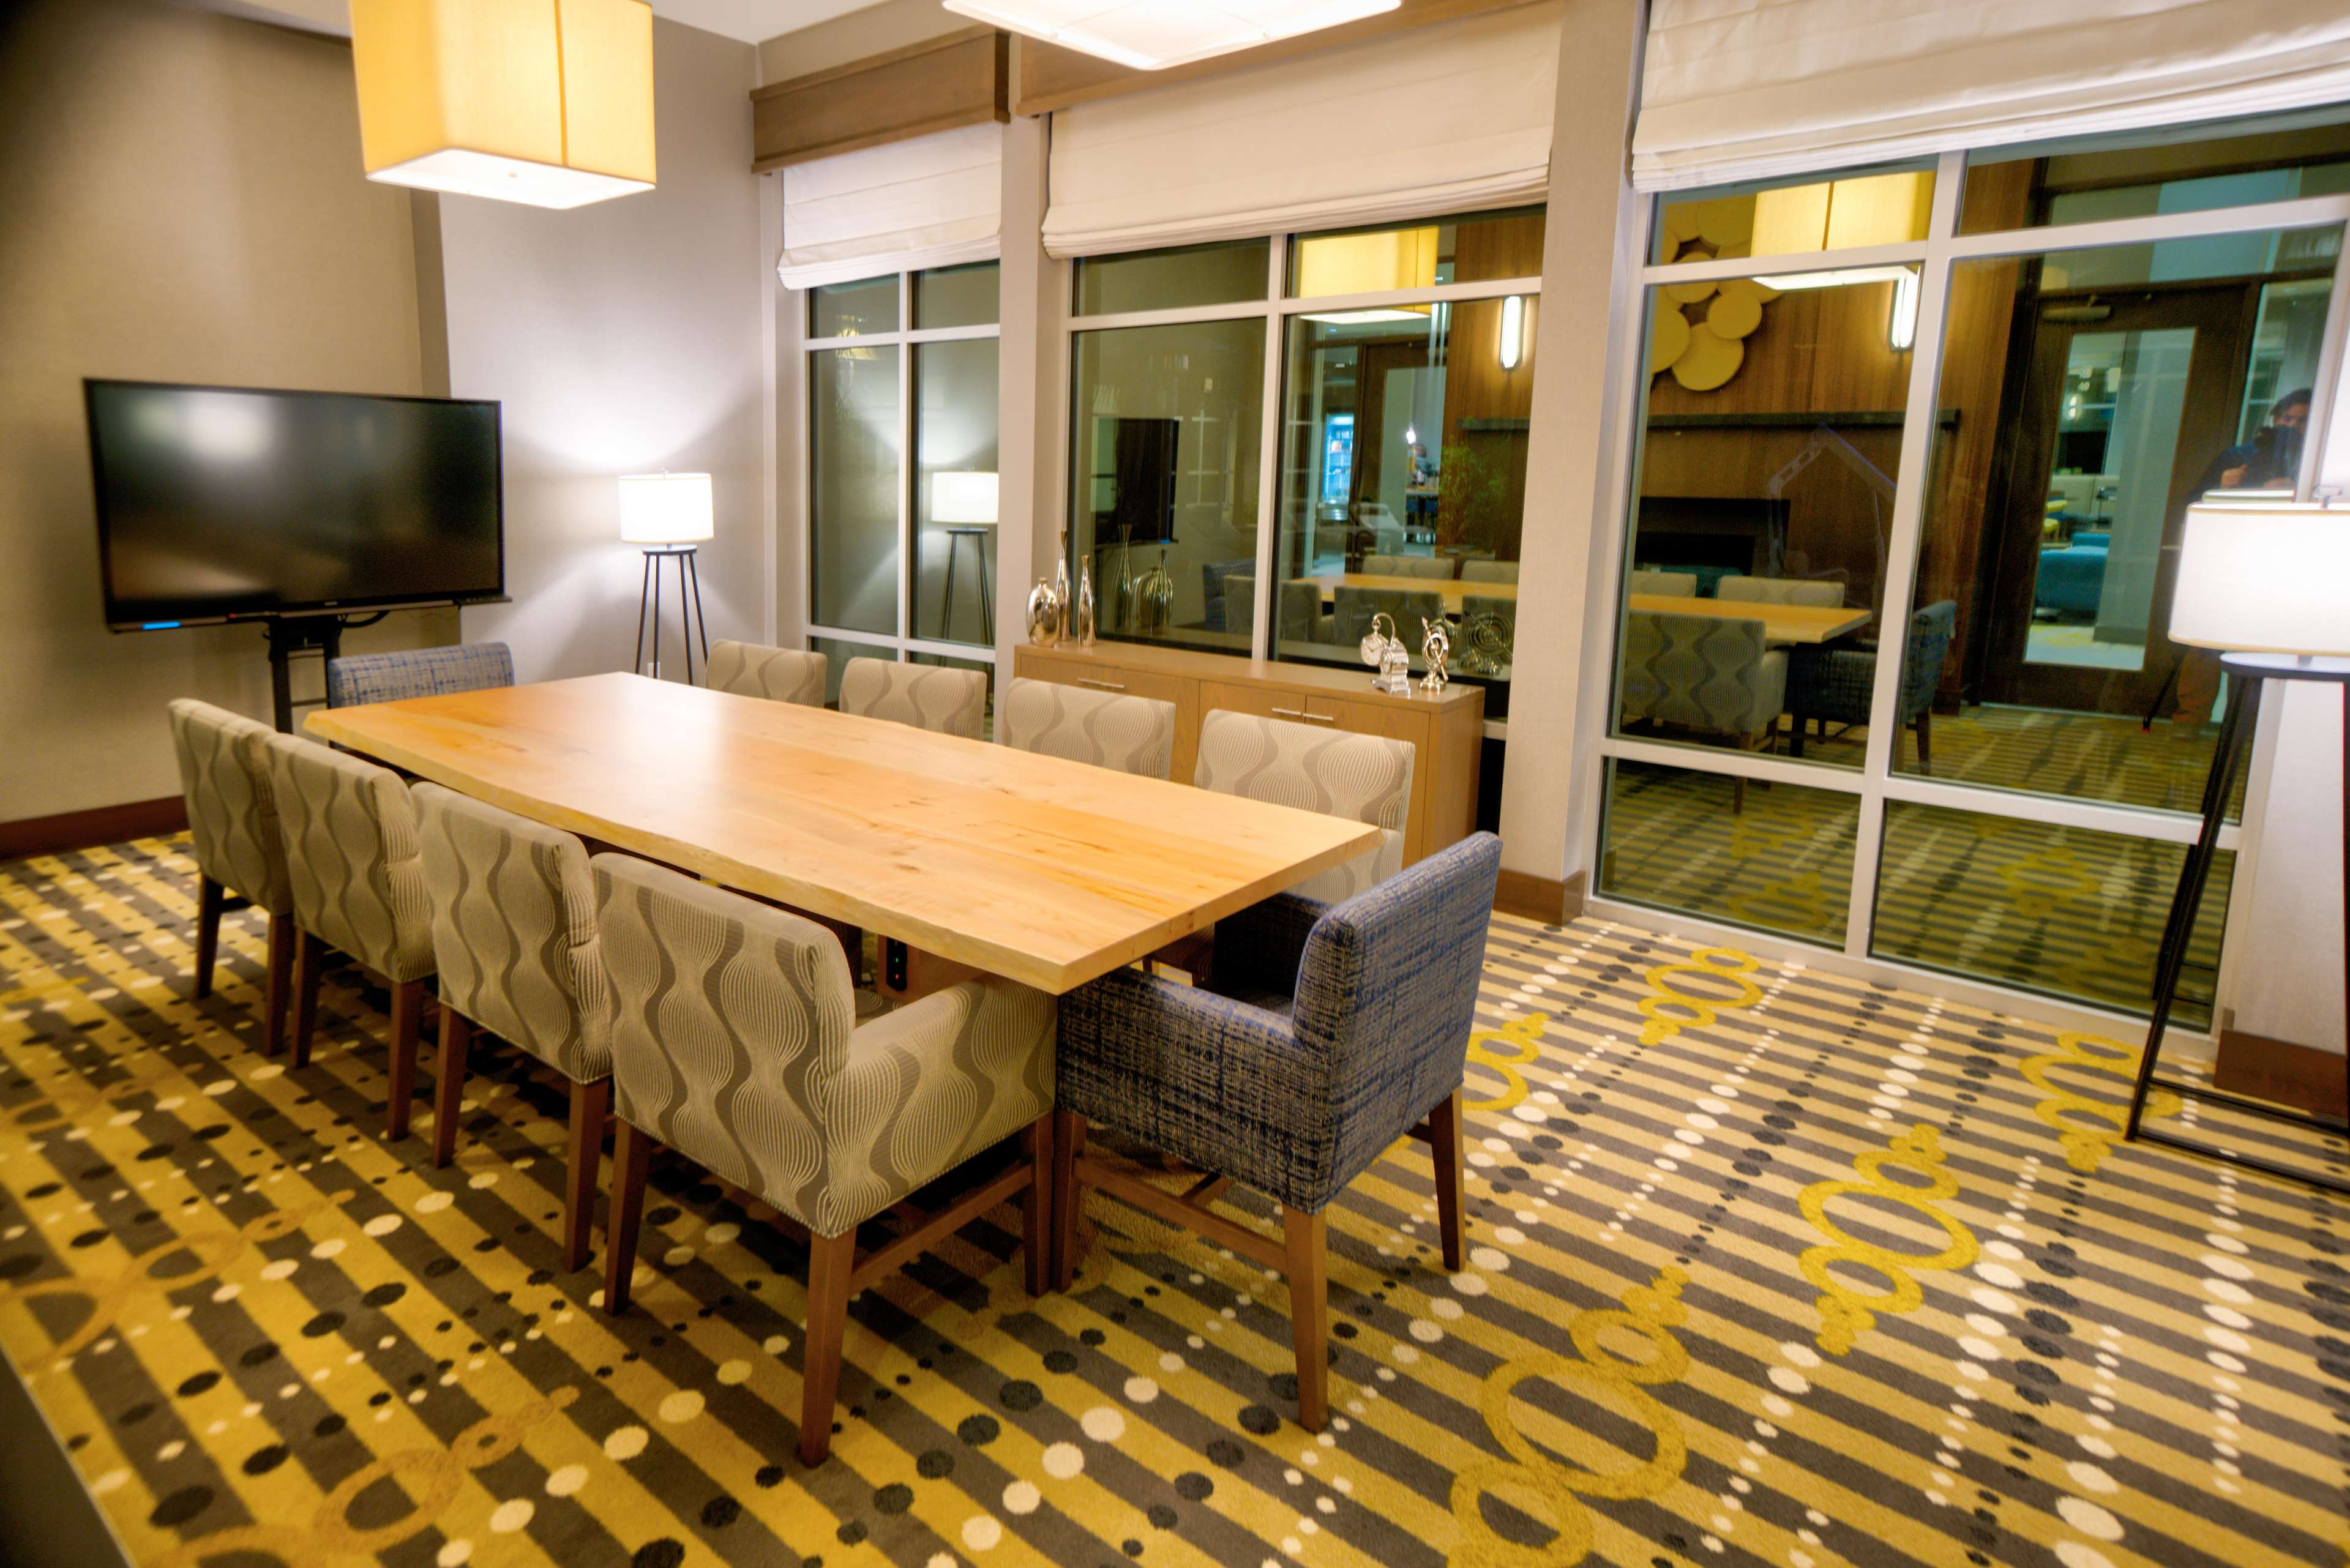 Hilton Garden Inn Santa Barbara/Goleta image 42